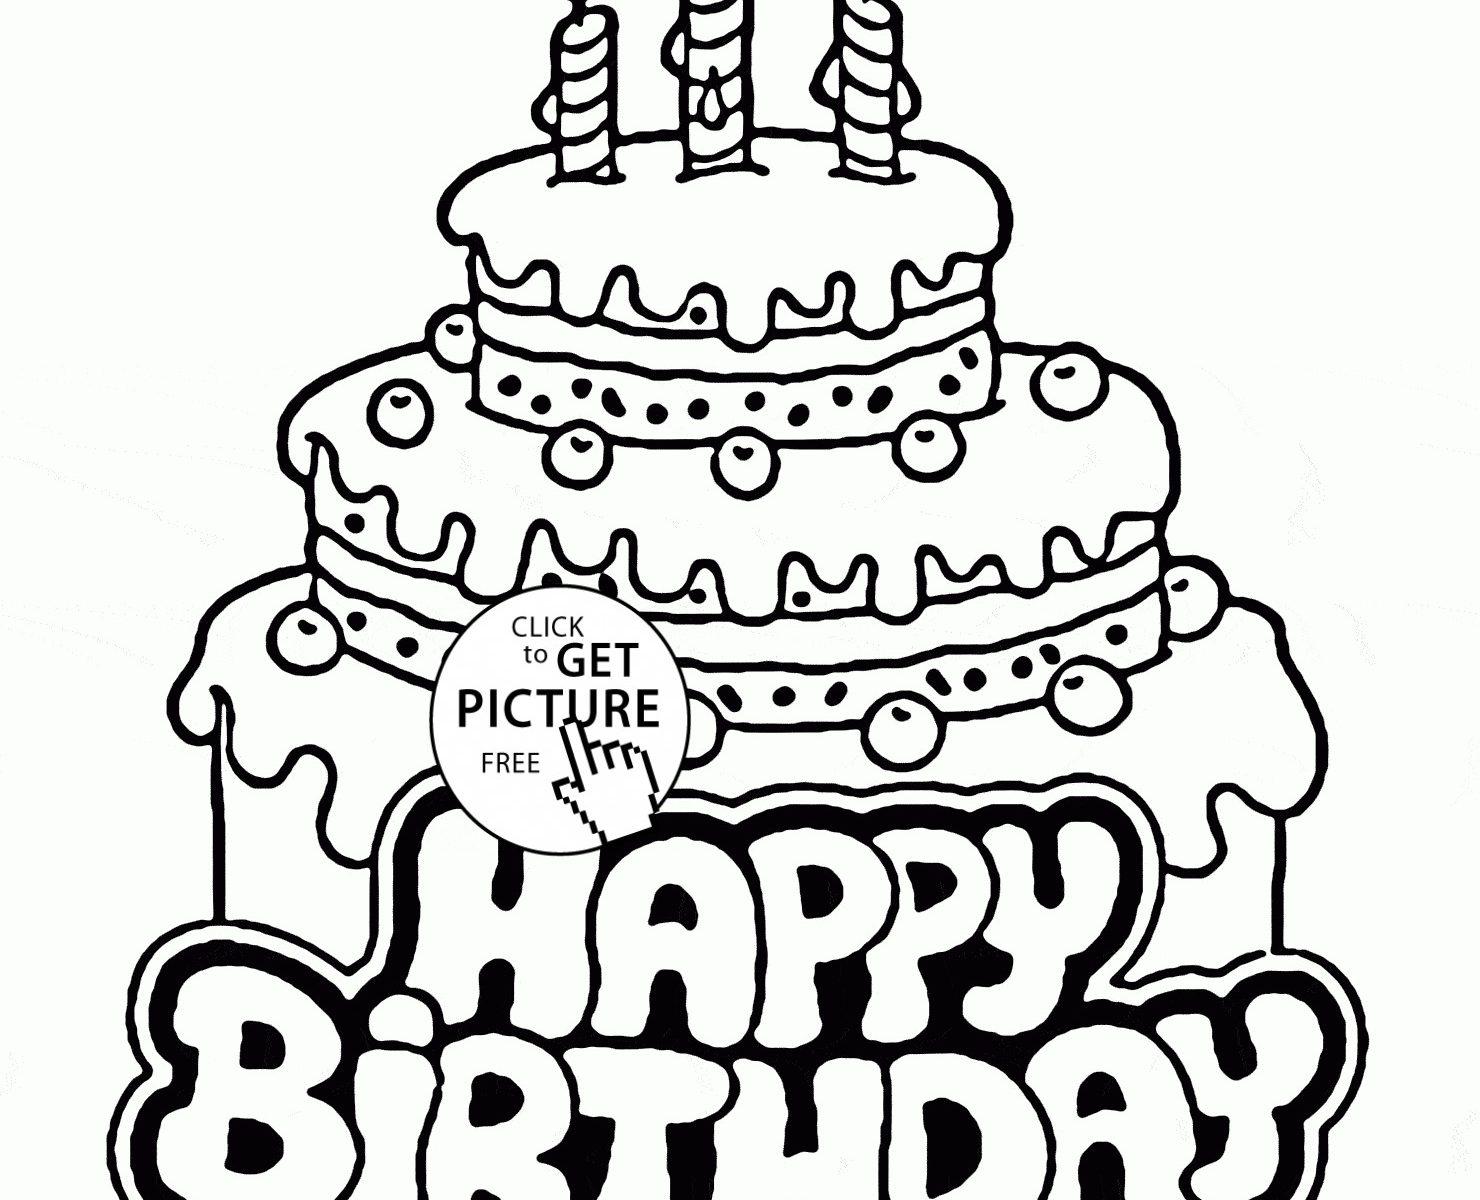 1480x1200 Free Birthdayakeoloring Pages To Print Page Printableolouring